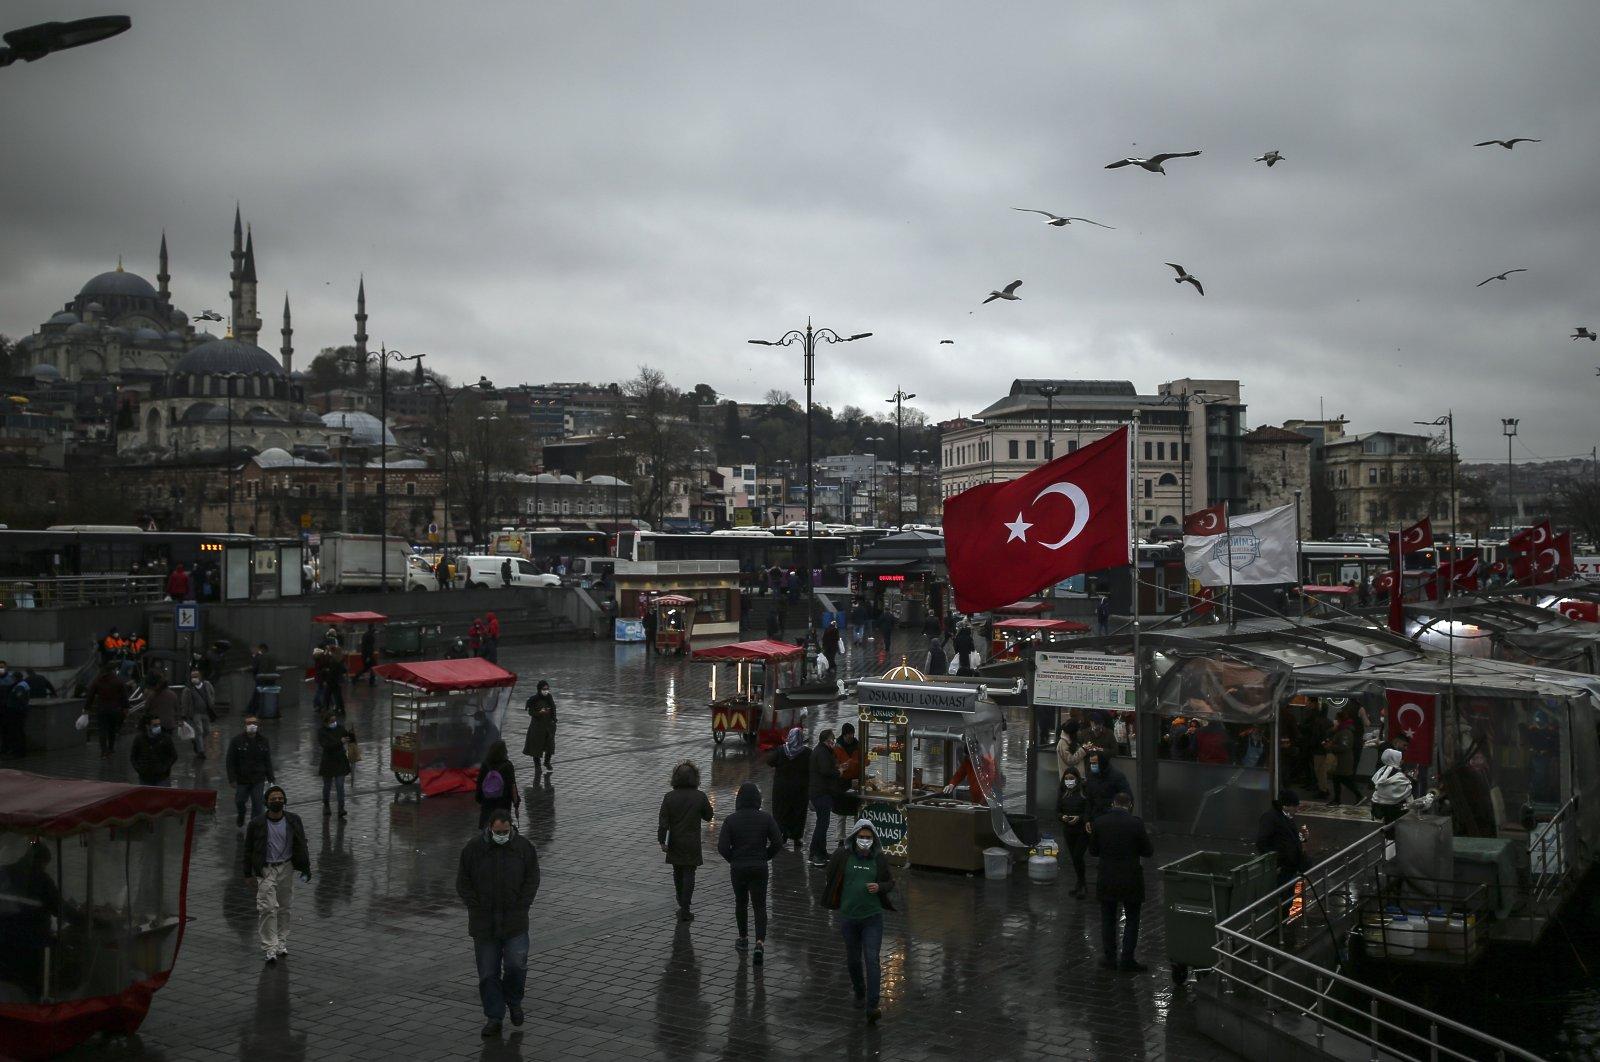 People walk around the Eminönü neighborhood by the Golden Horn in Istanbul, Turkey, Dec. 15, 2020. (AP Photo)